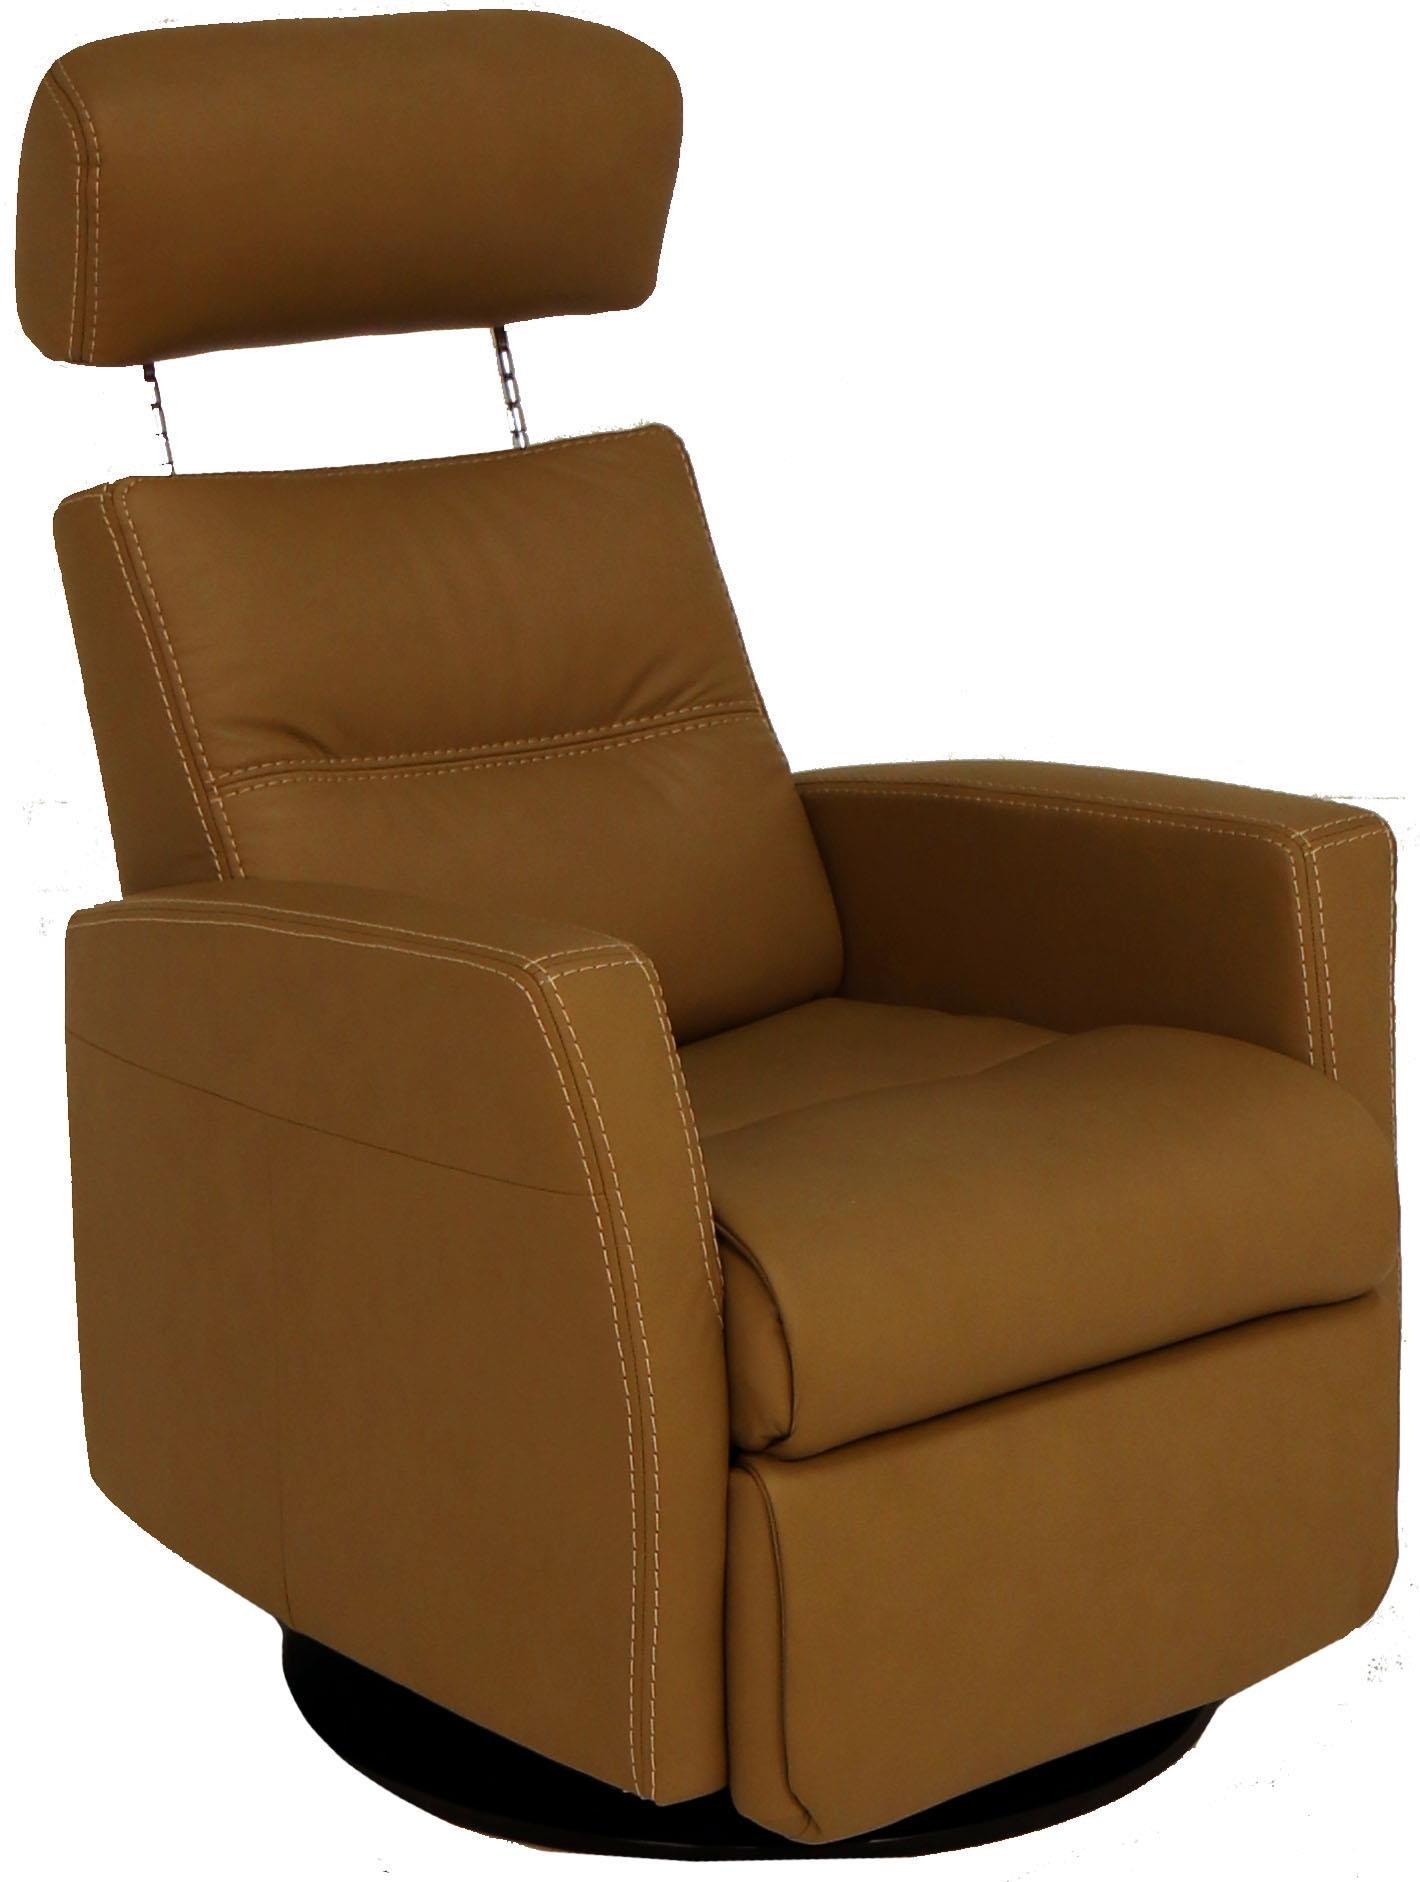 Divani  Divani Power Compact Relaxer by Vendor 508 at Becker Furniture